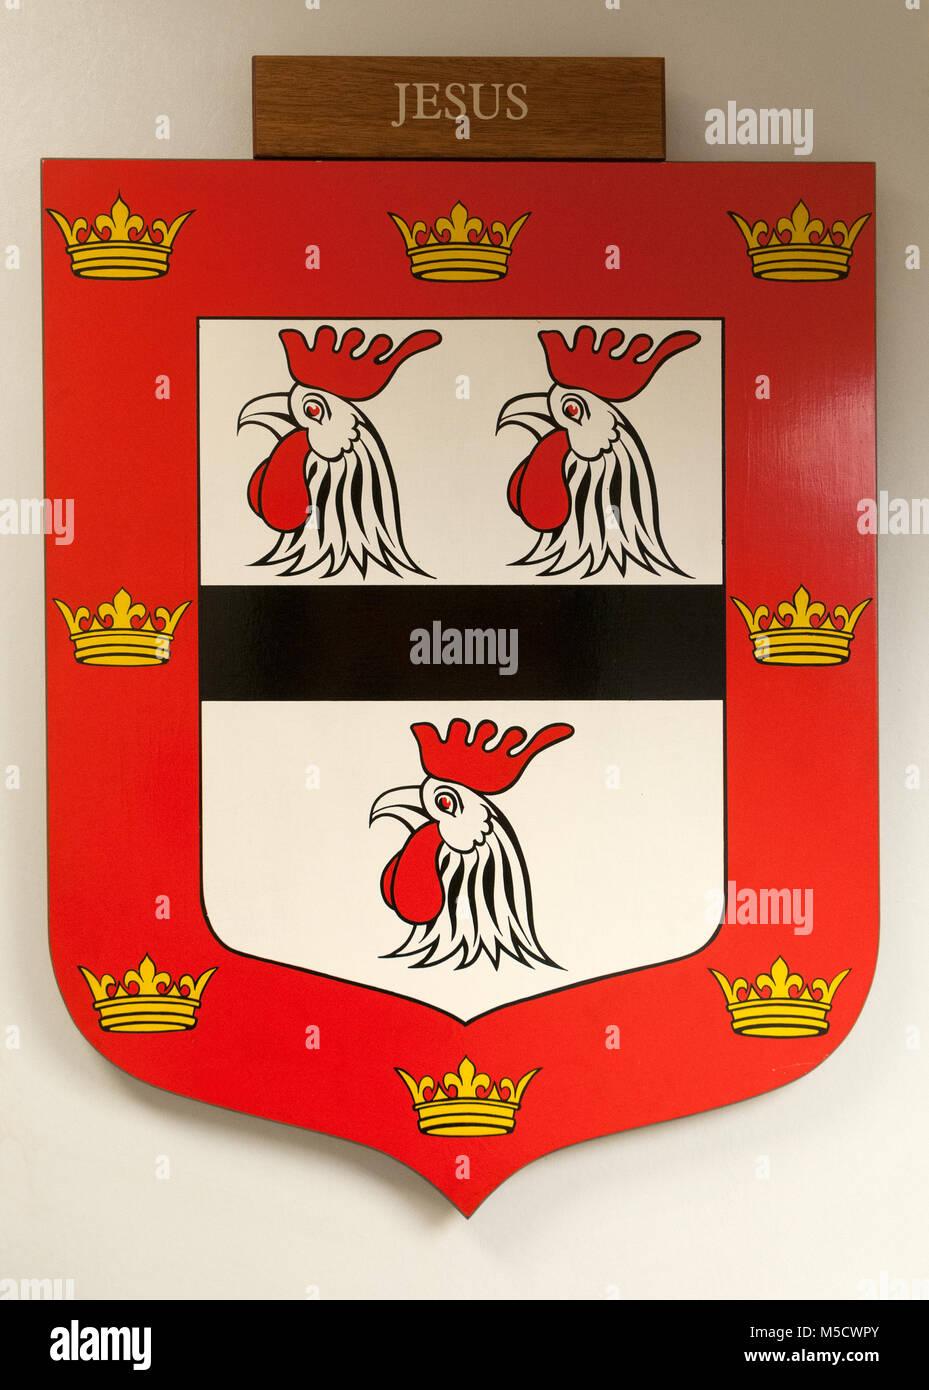 CAMBRIDGE, ENGLAND, UK - DECEMBER 03 2011: Coat of Arms of Jesus College Cambridge - Stock Image